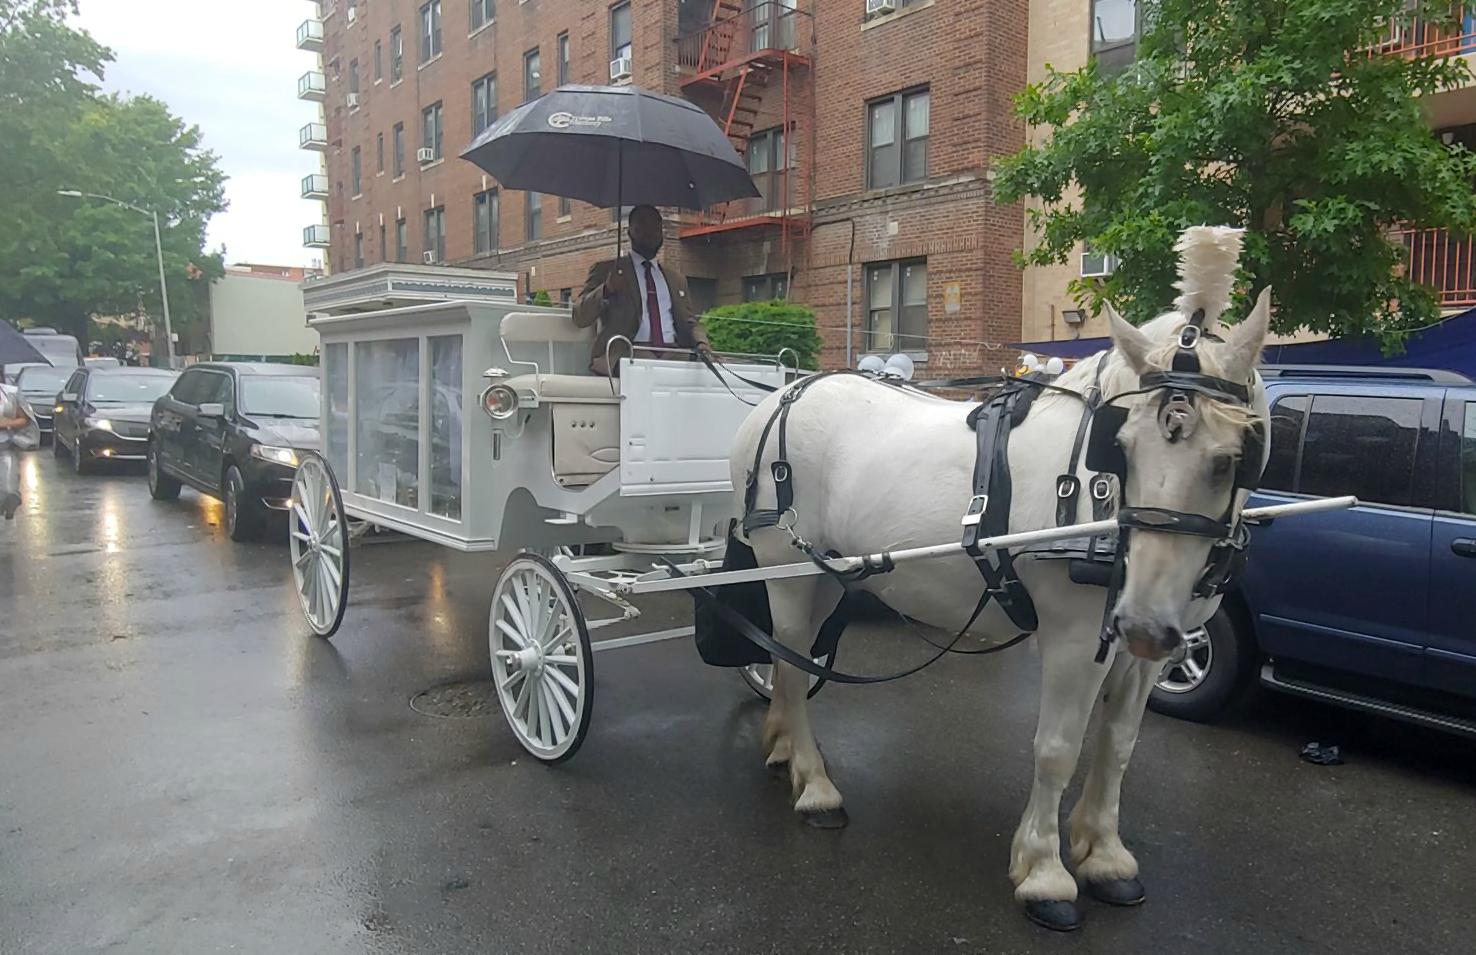 Dream Horse Carriage Company: 2019Dream Horse Carriage